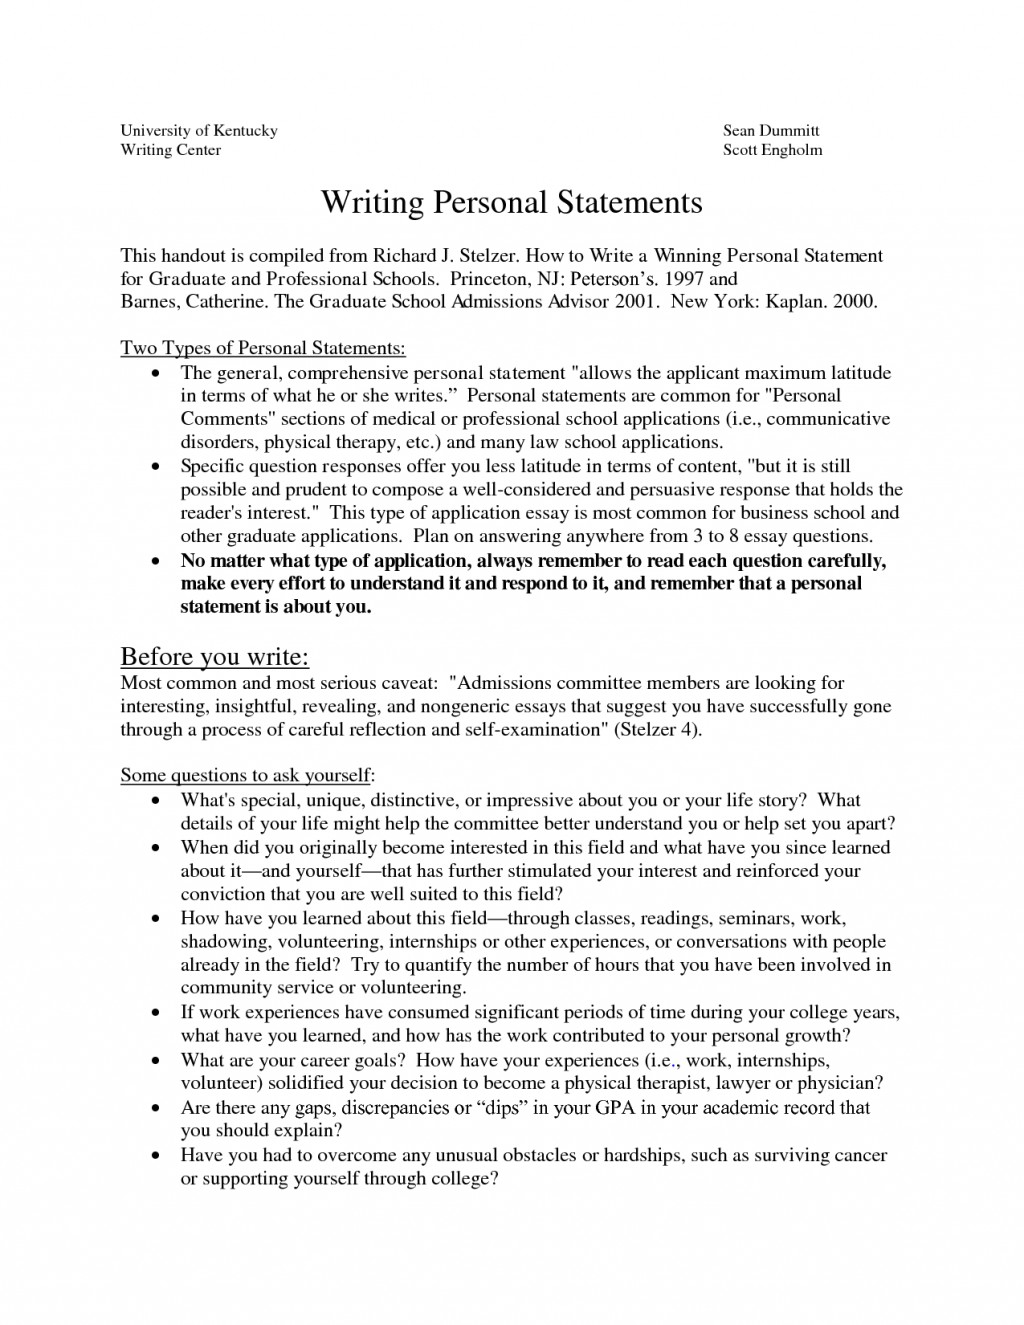 004 Essay Example Free Sample For Graduate School Formidable Admission Pdf Large